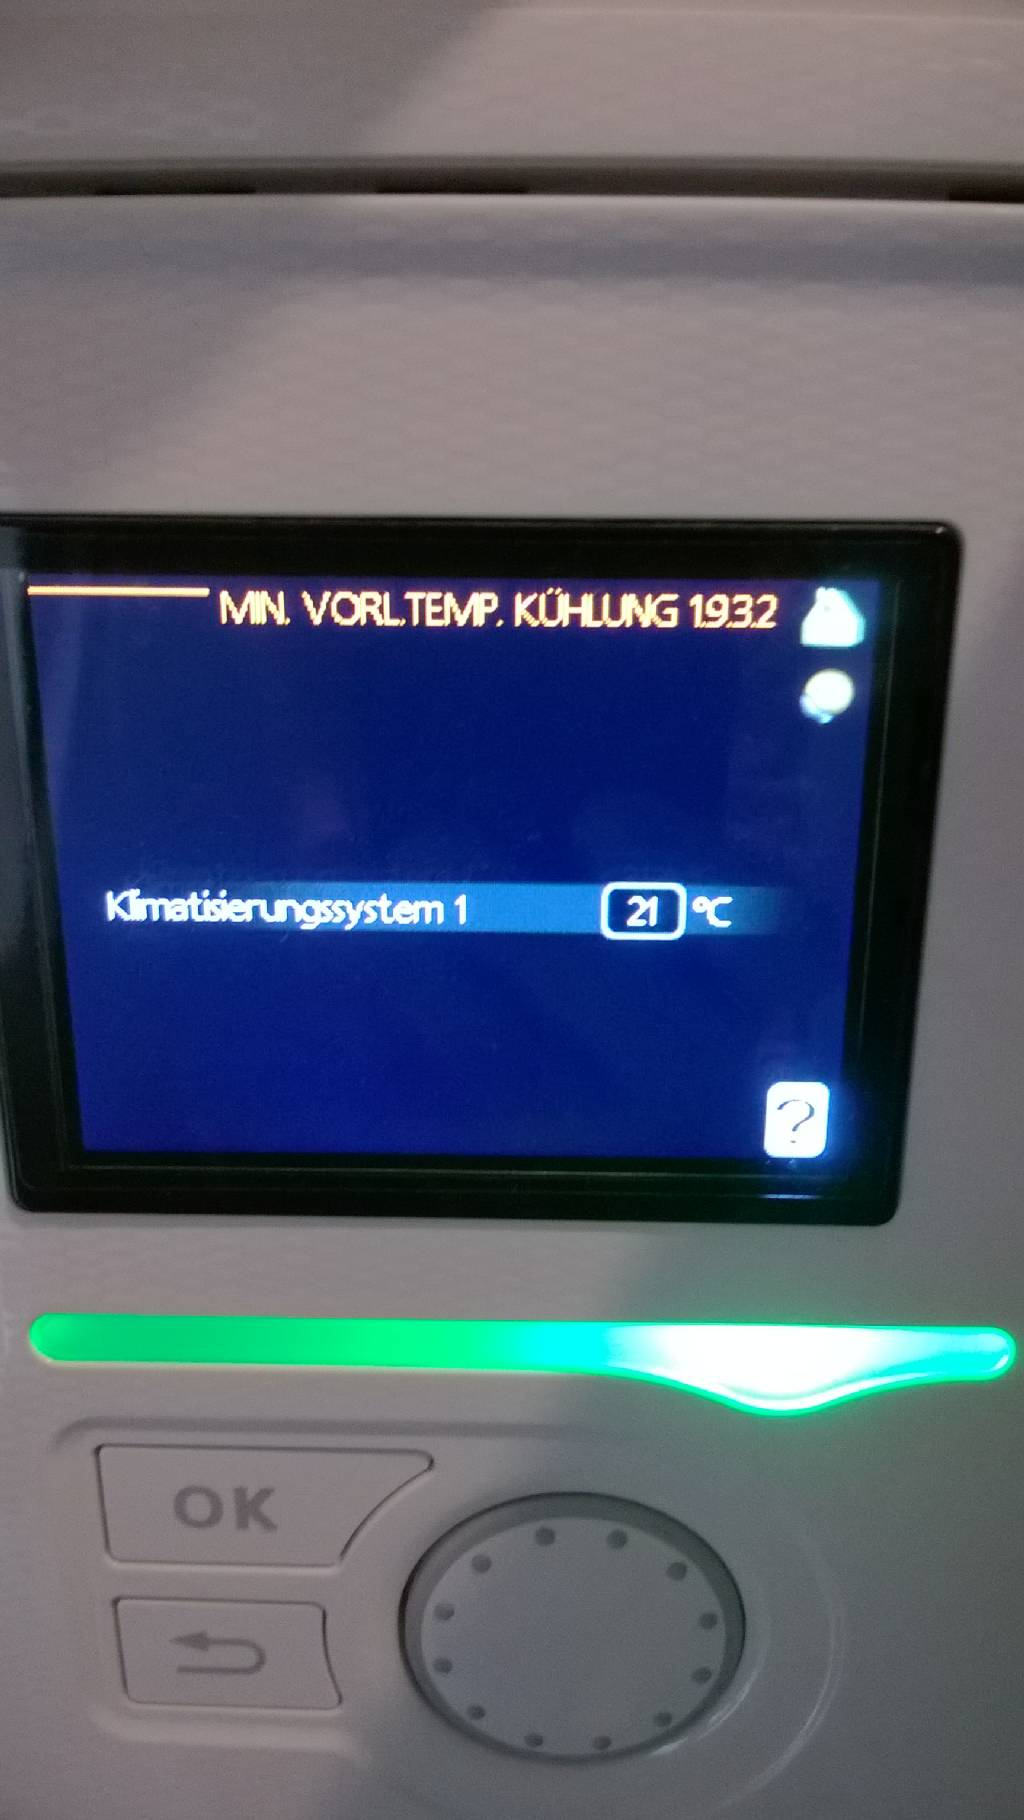 http://www.energiesparhaus.at/bilderupload2016/20160628410579.JPG